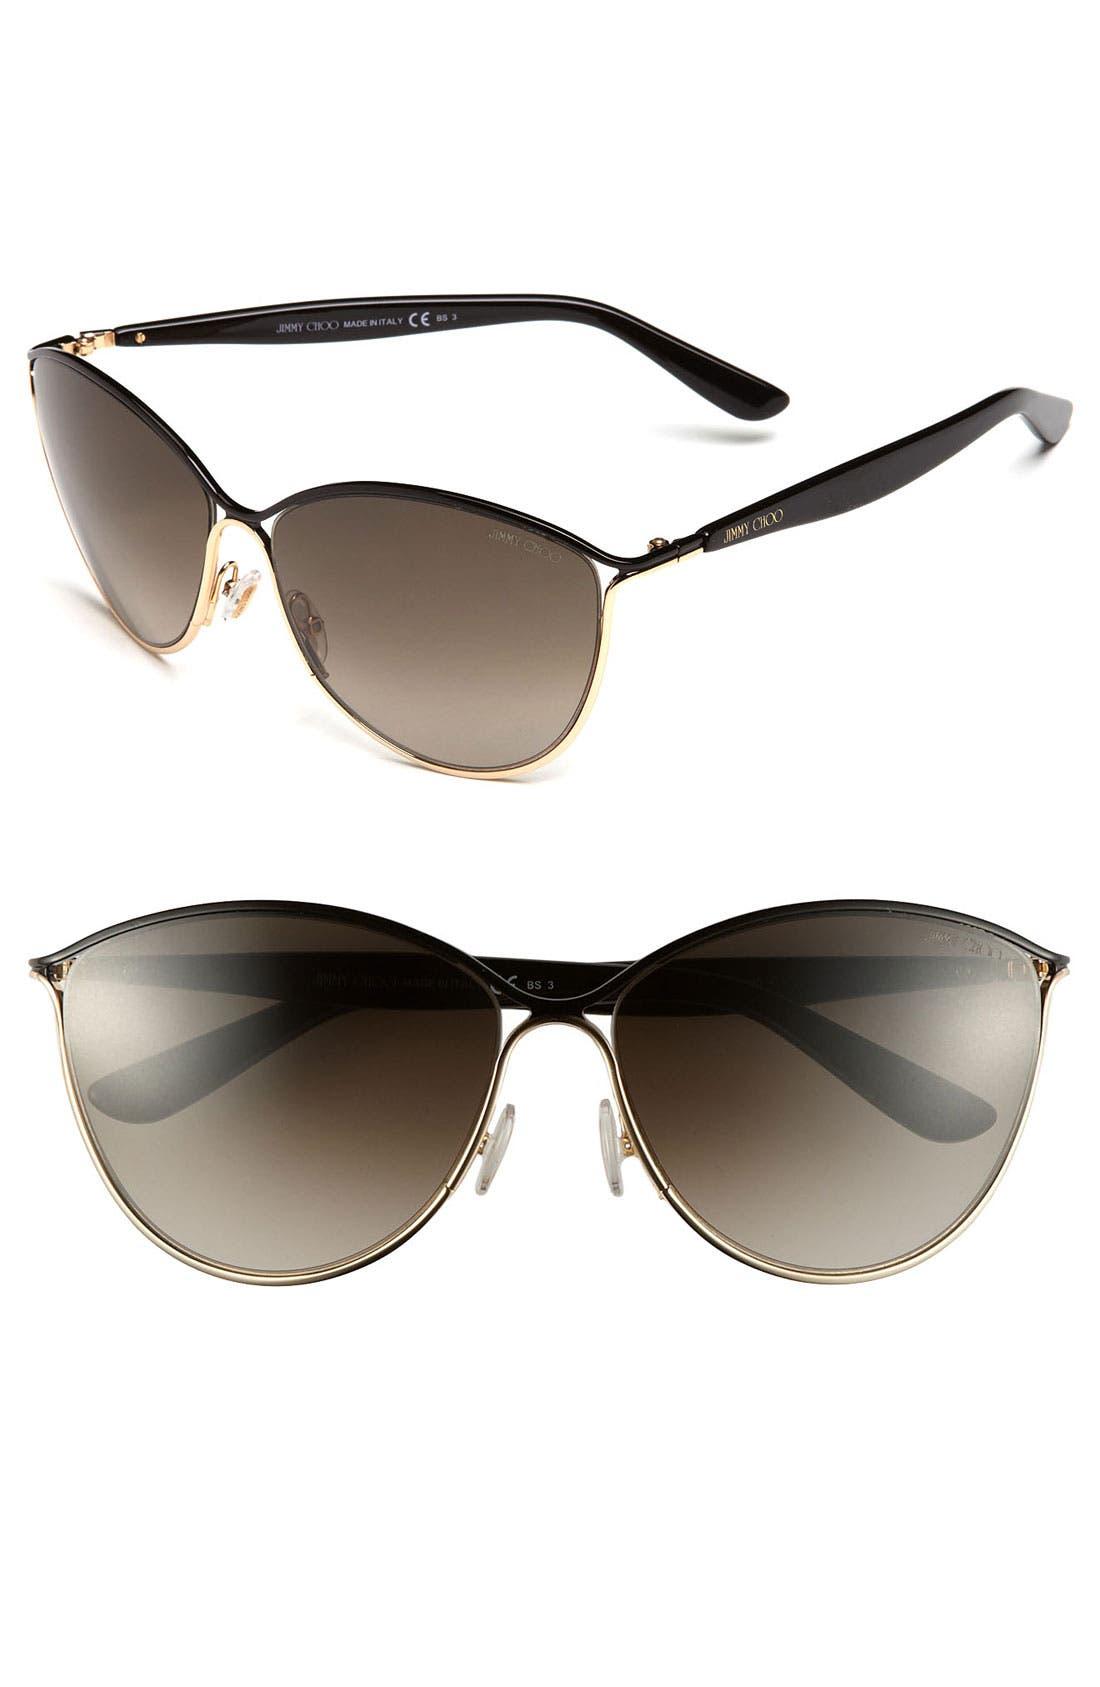 Main Image - Jimmy Choo 'Tanis' 59mm Cat's Eye Sunglasses